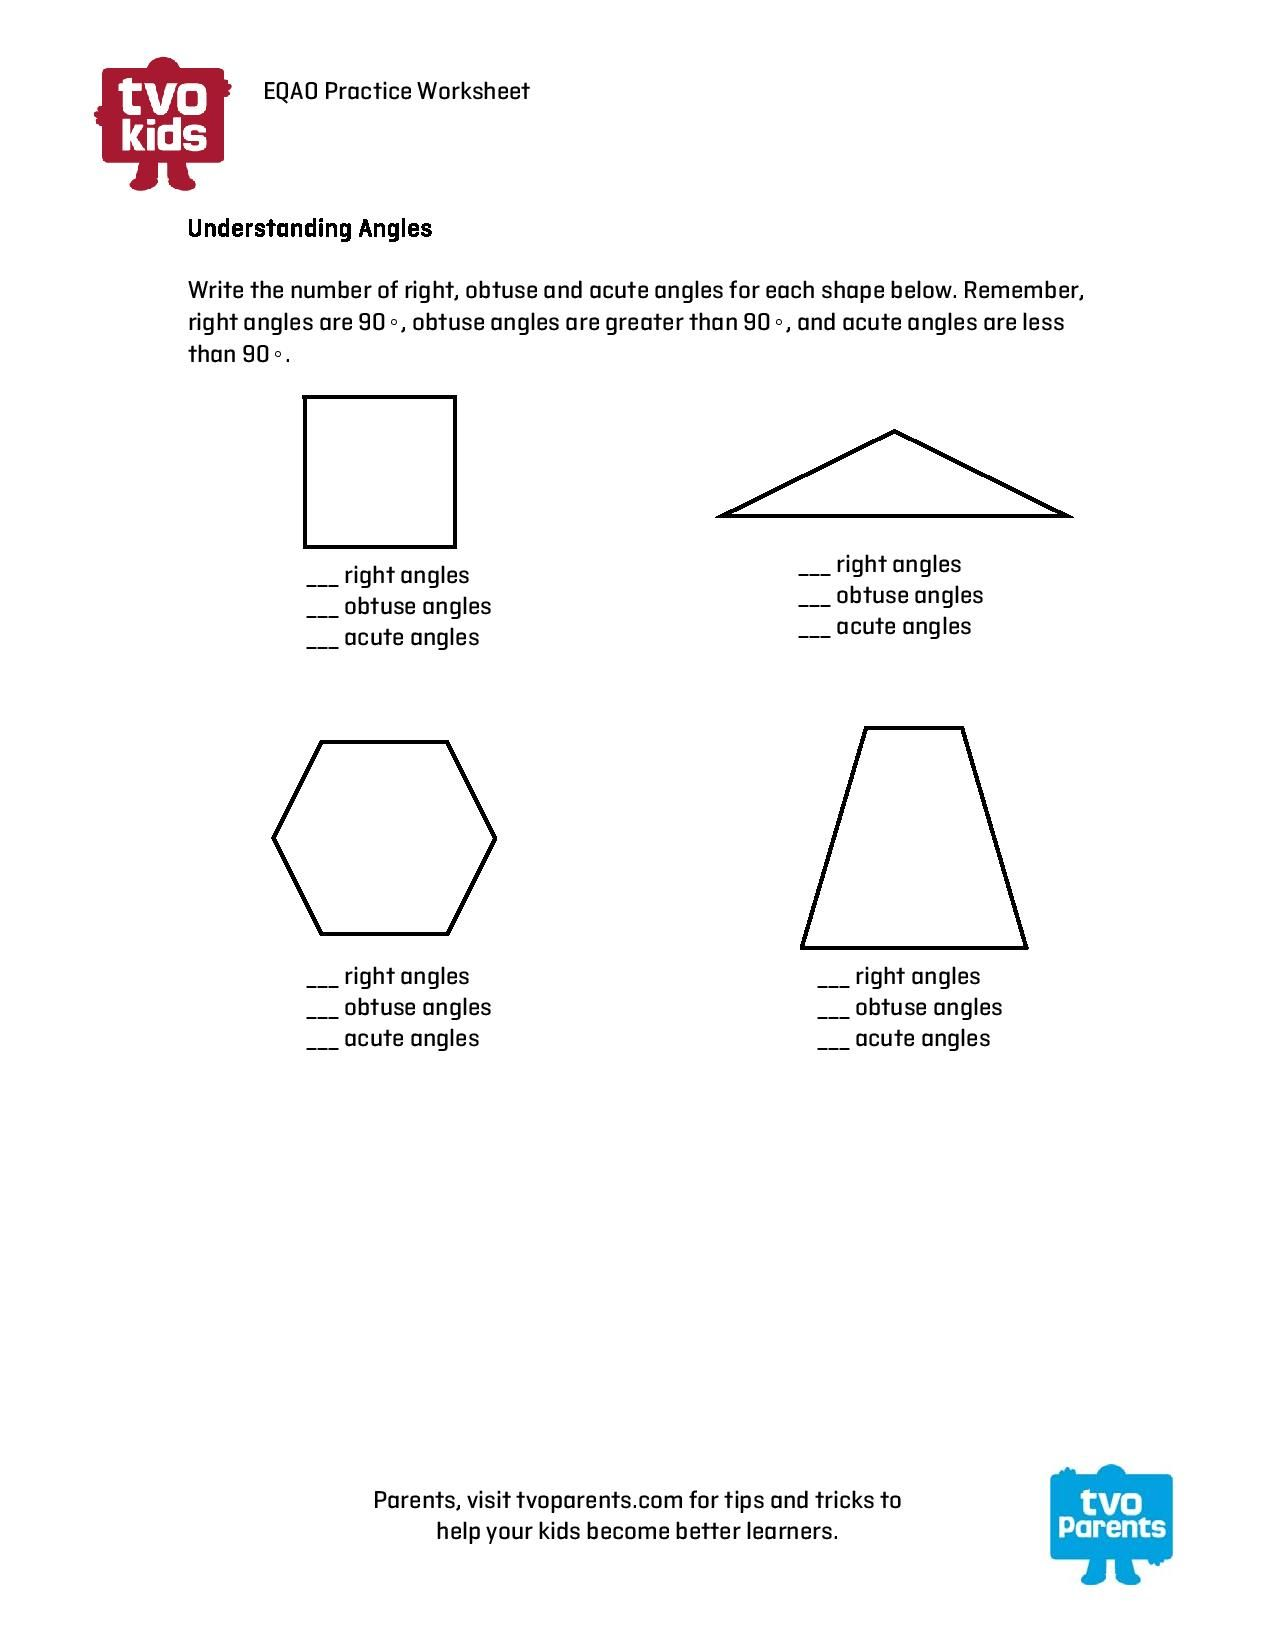 Understanding Angles Worksheet For Grade 6 Printdownload Here